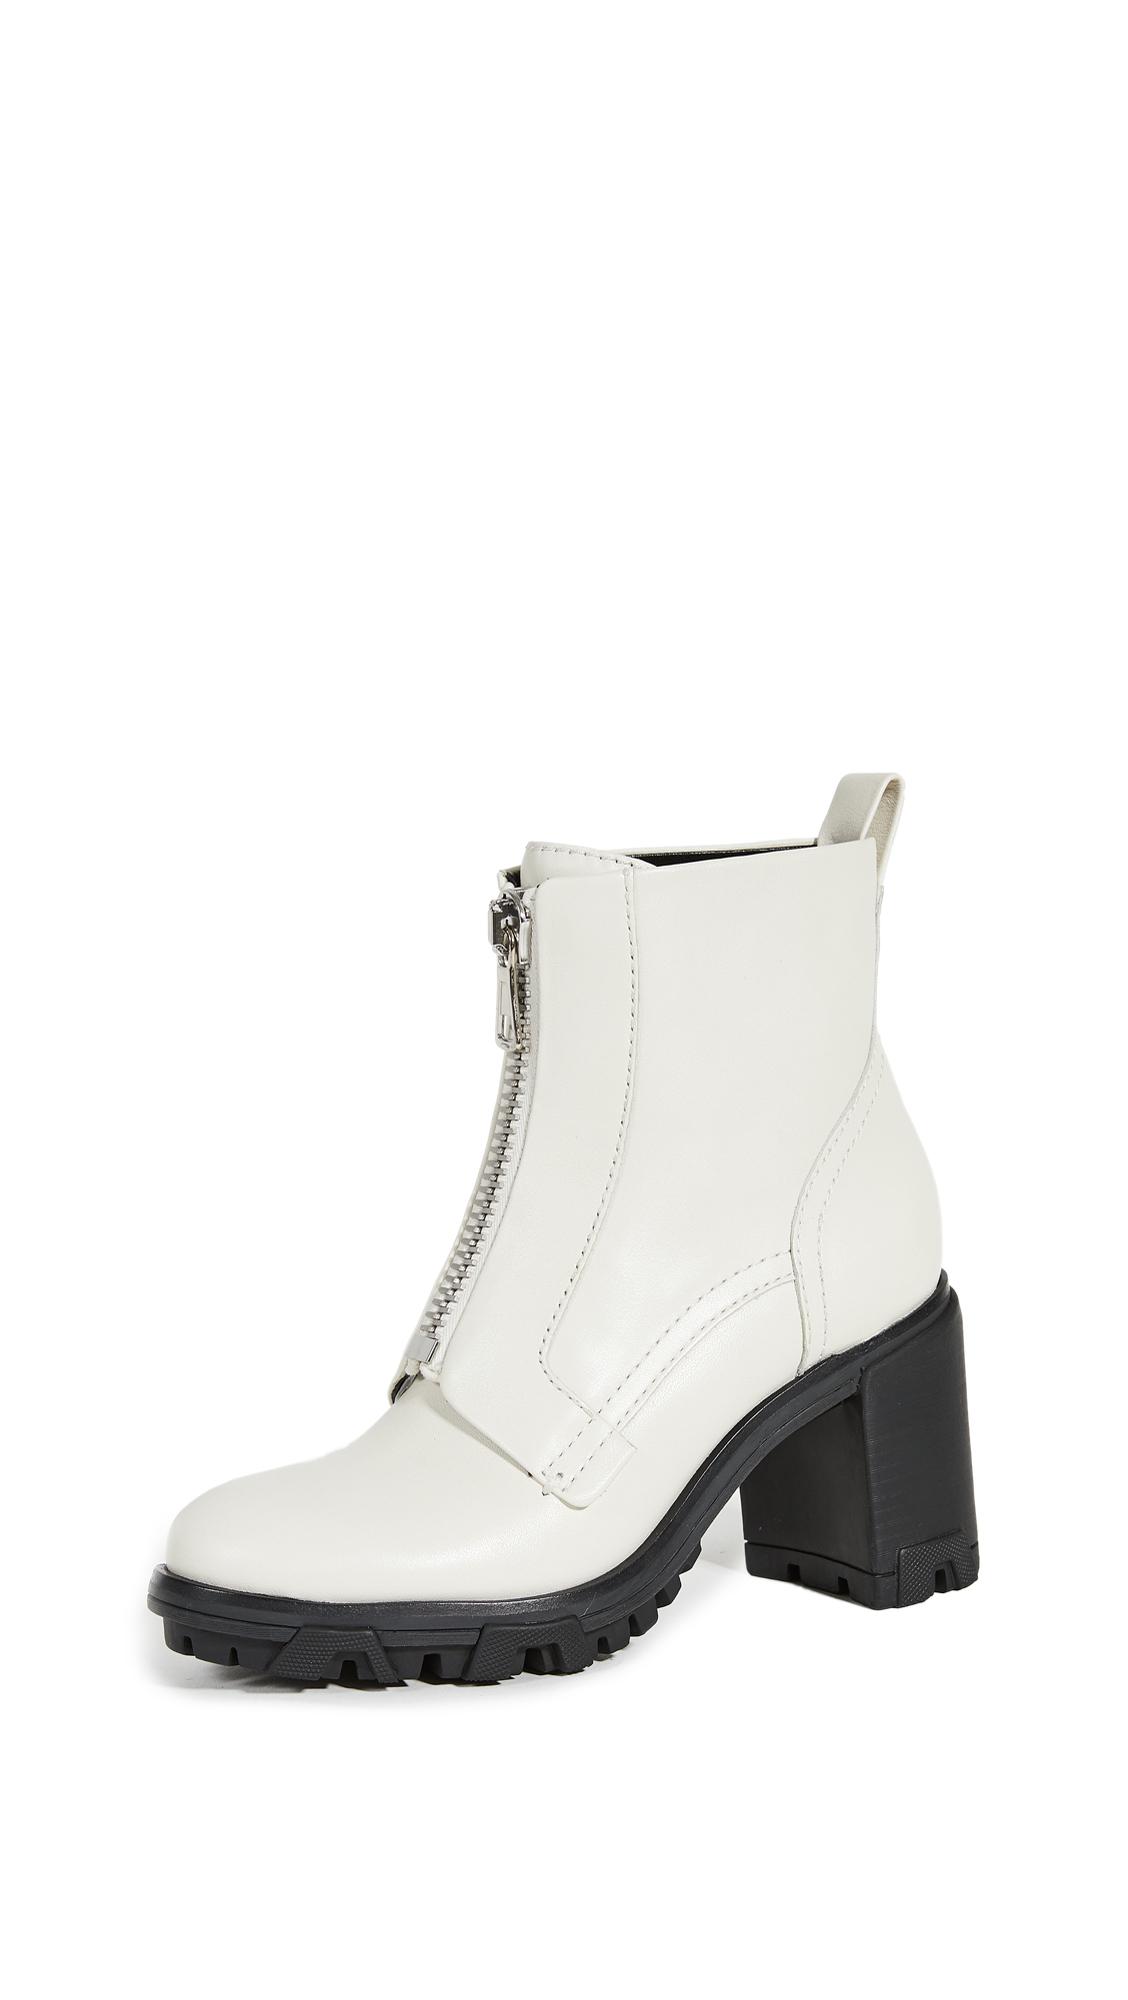 Rag & Bone Shiloh High Zip Boots